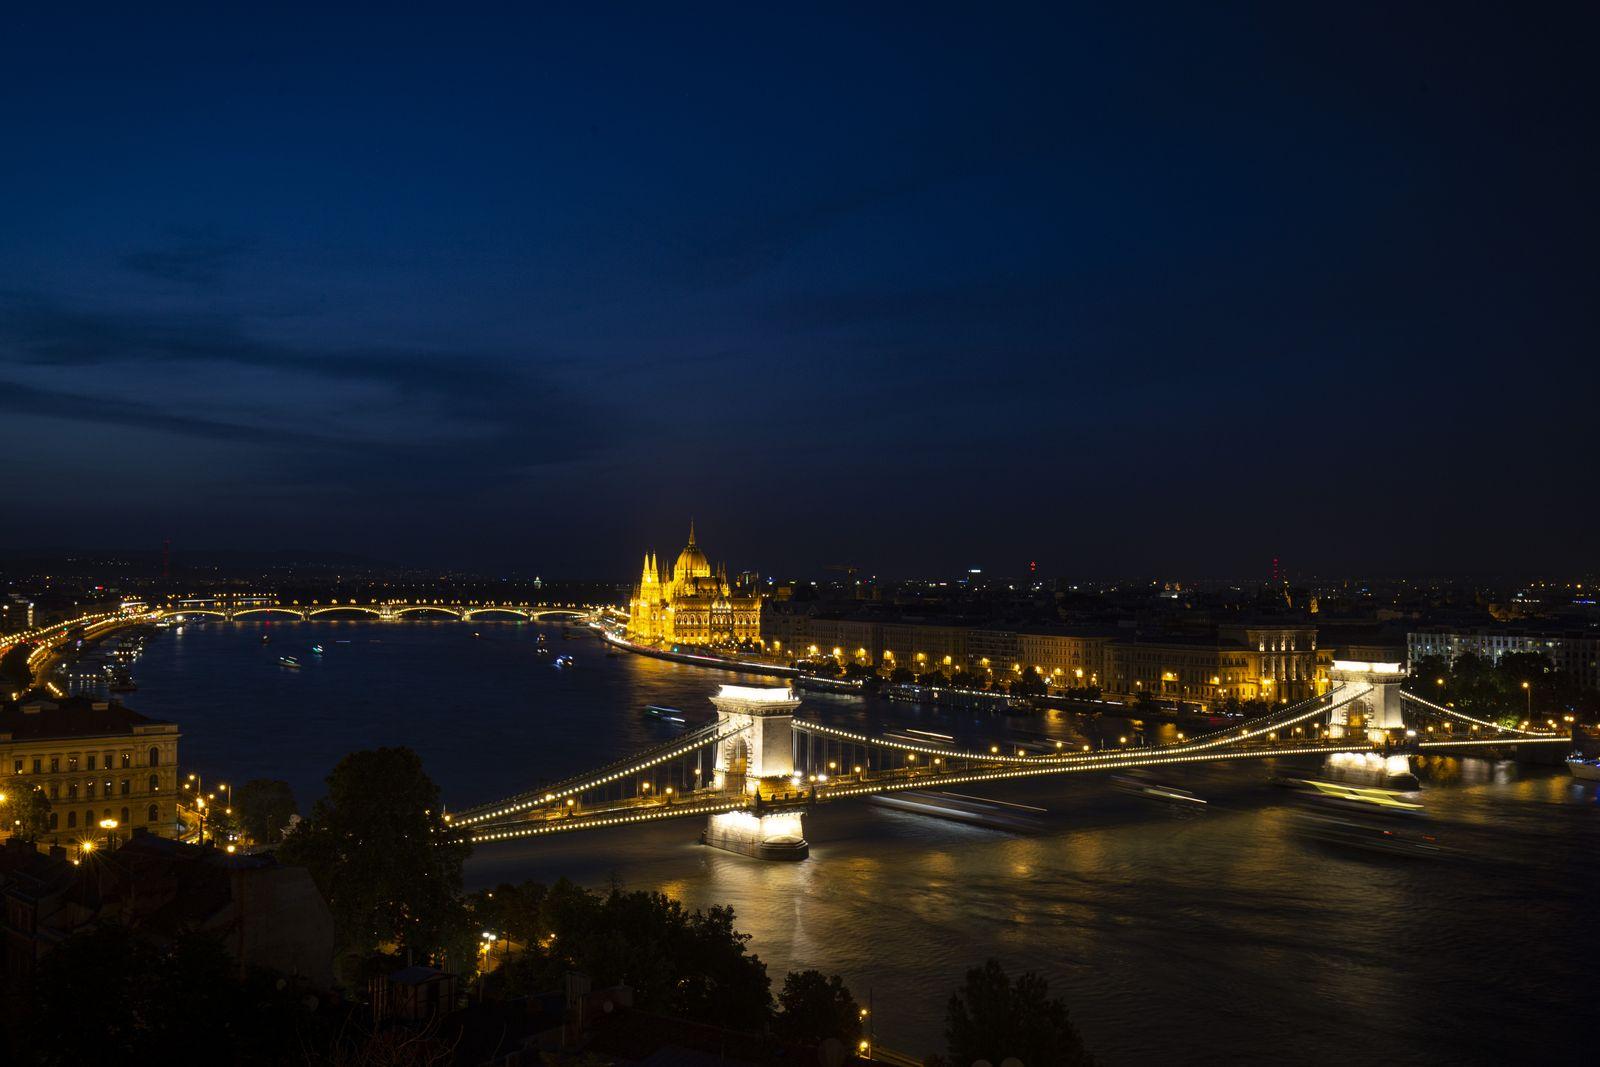 Budapest at night - Jean-Nicolas Lehec